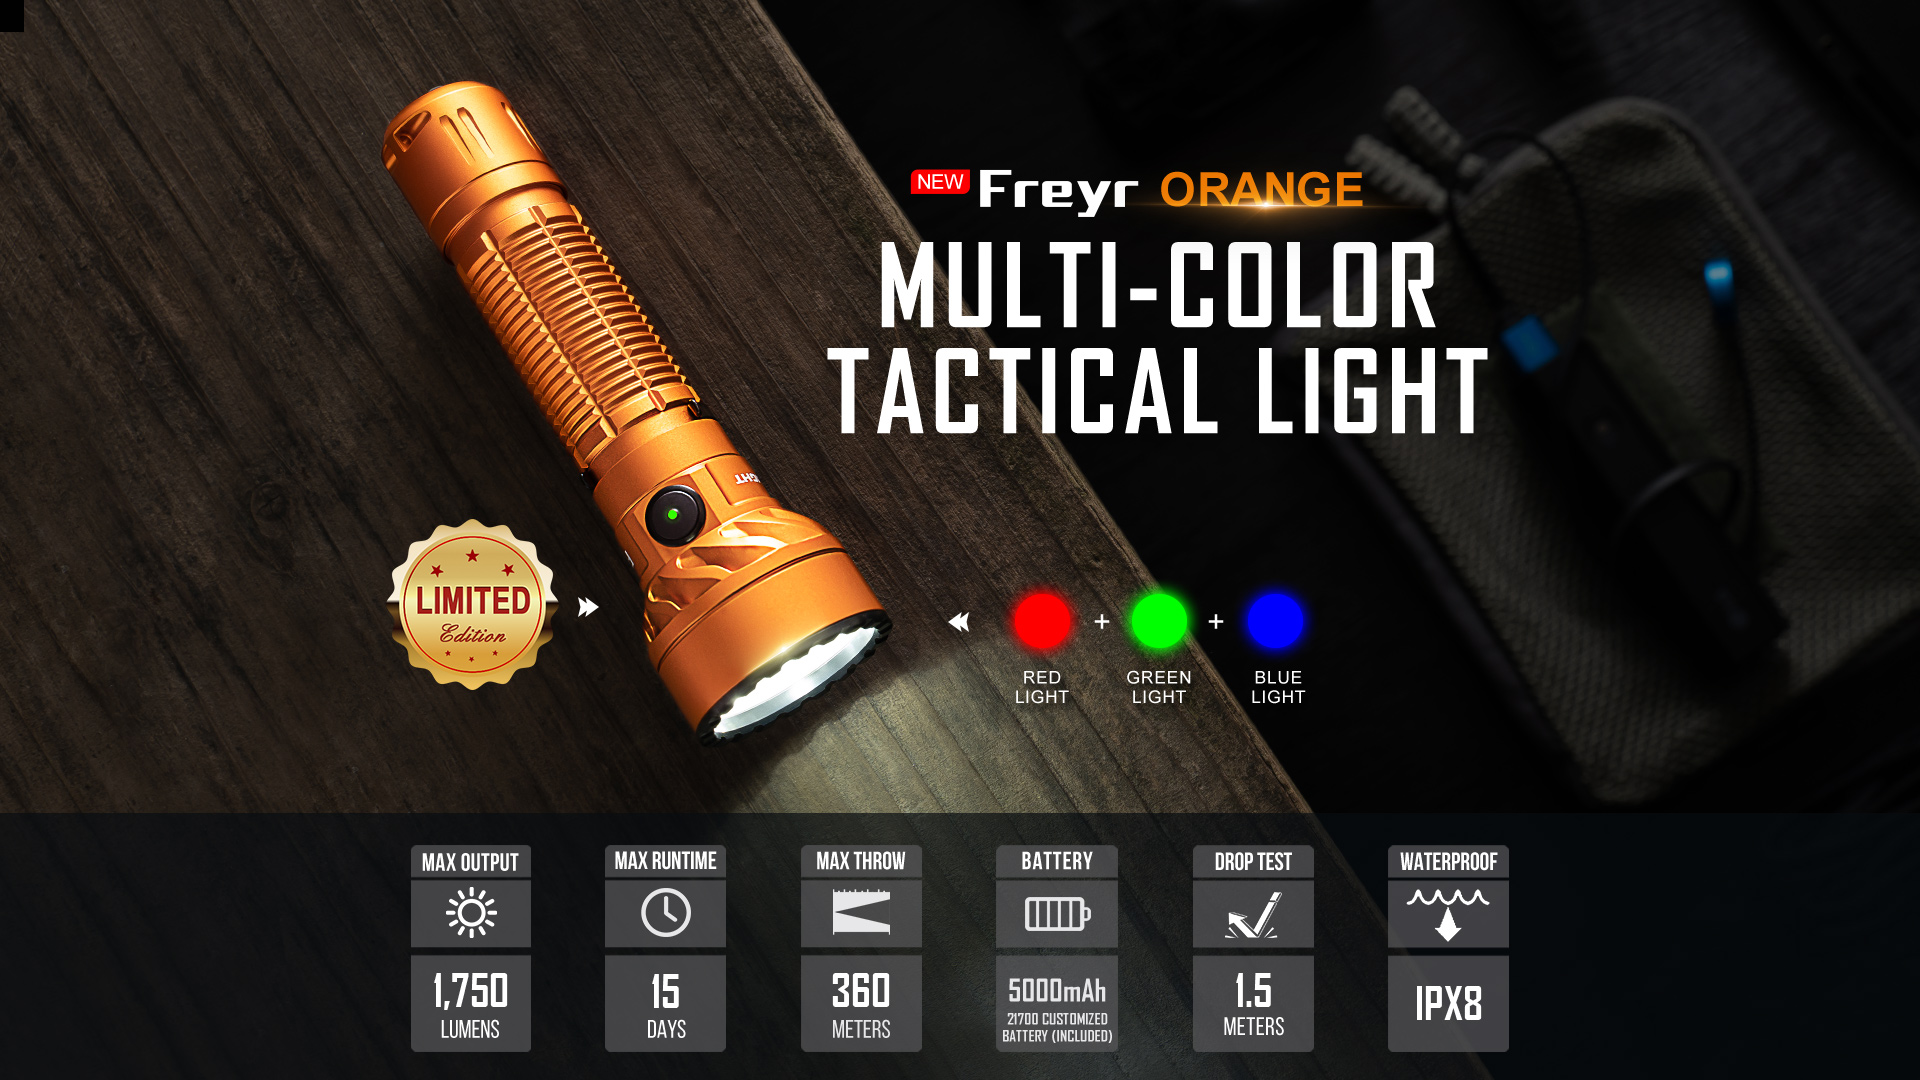 olight freyr multicolour light